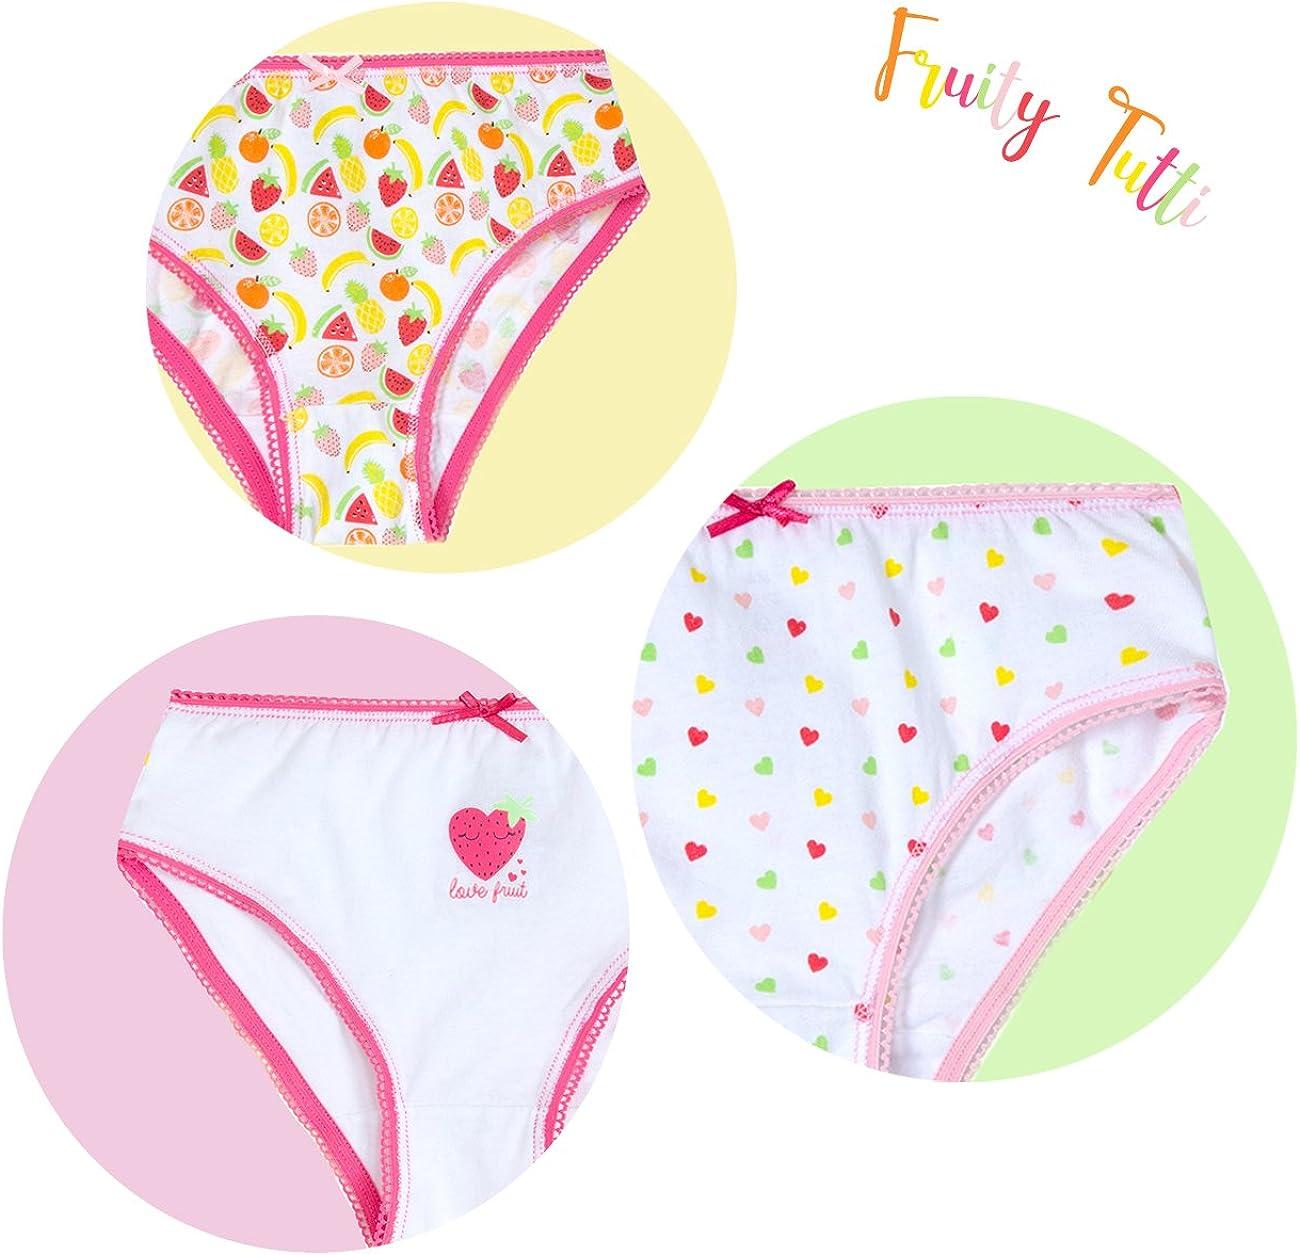 4Kidz Infant Girls Everyday Fun Printed Cotton Knickers